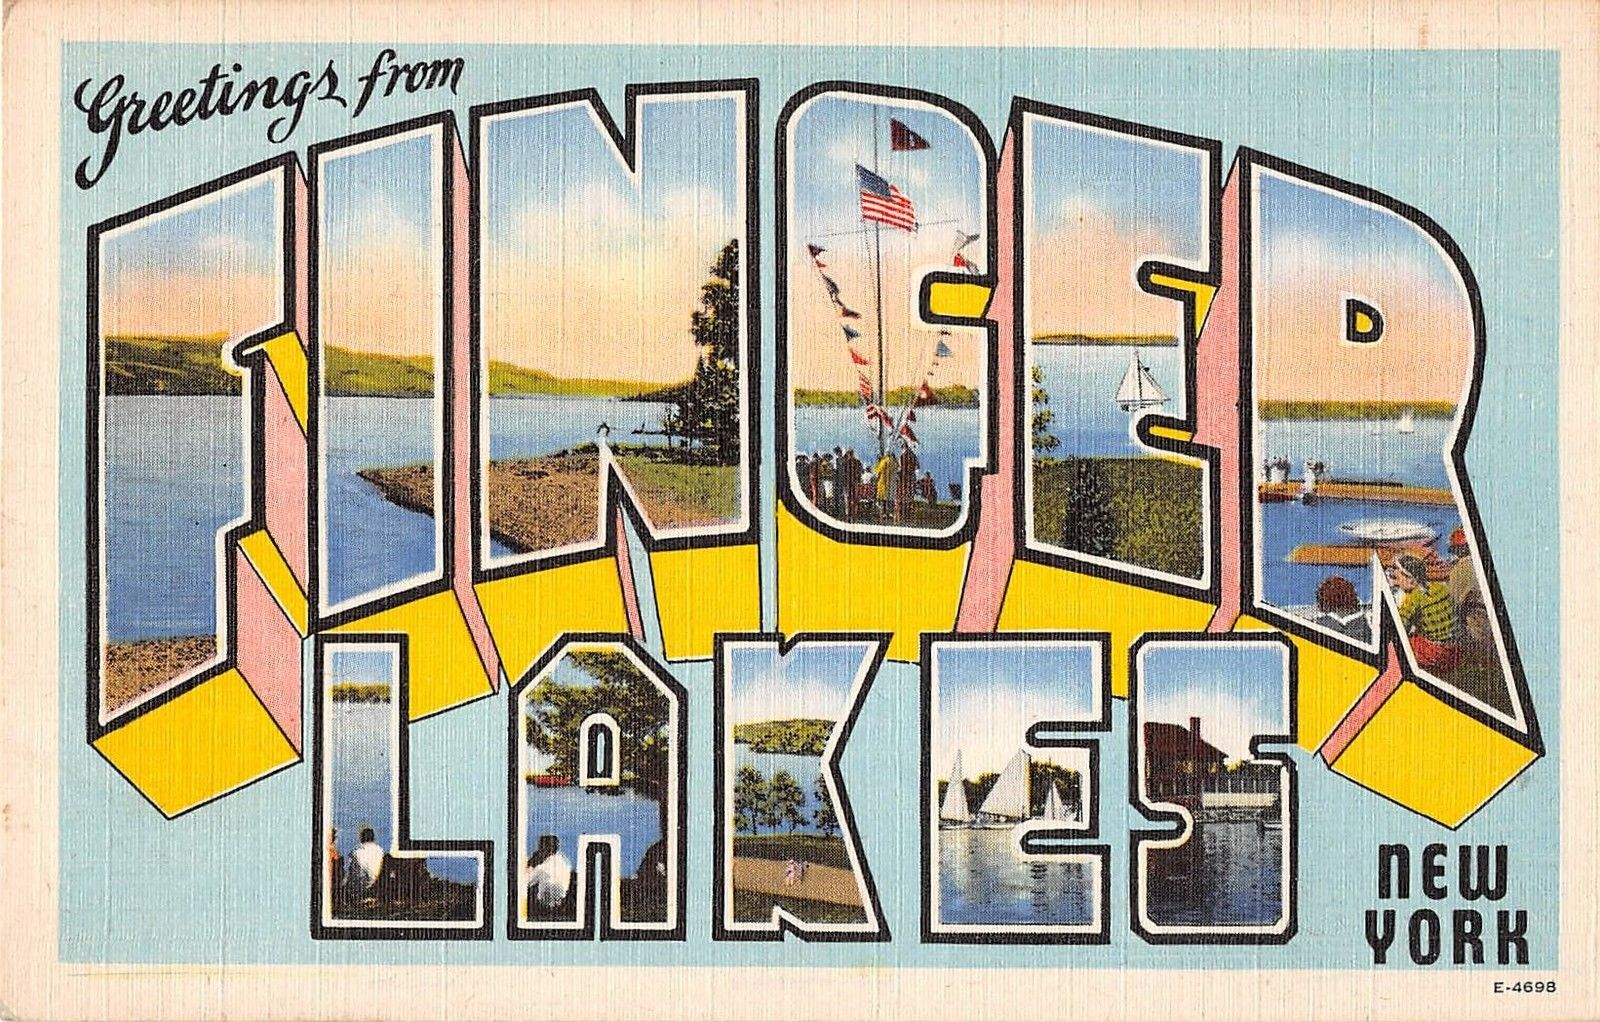 Finger Lakes New York Greetings Large Letter Linen Antique Postcard